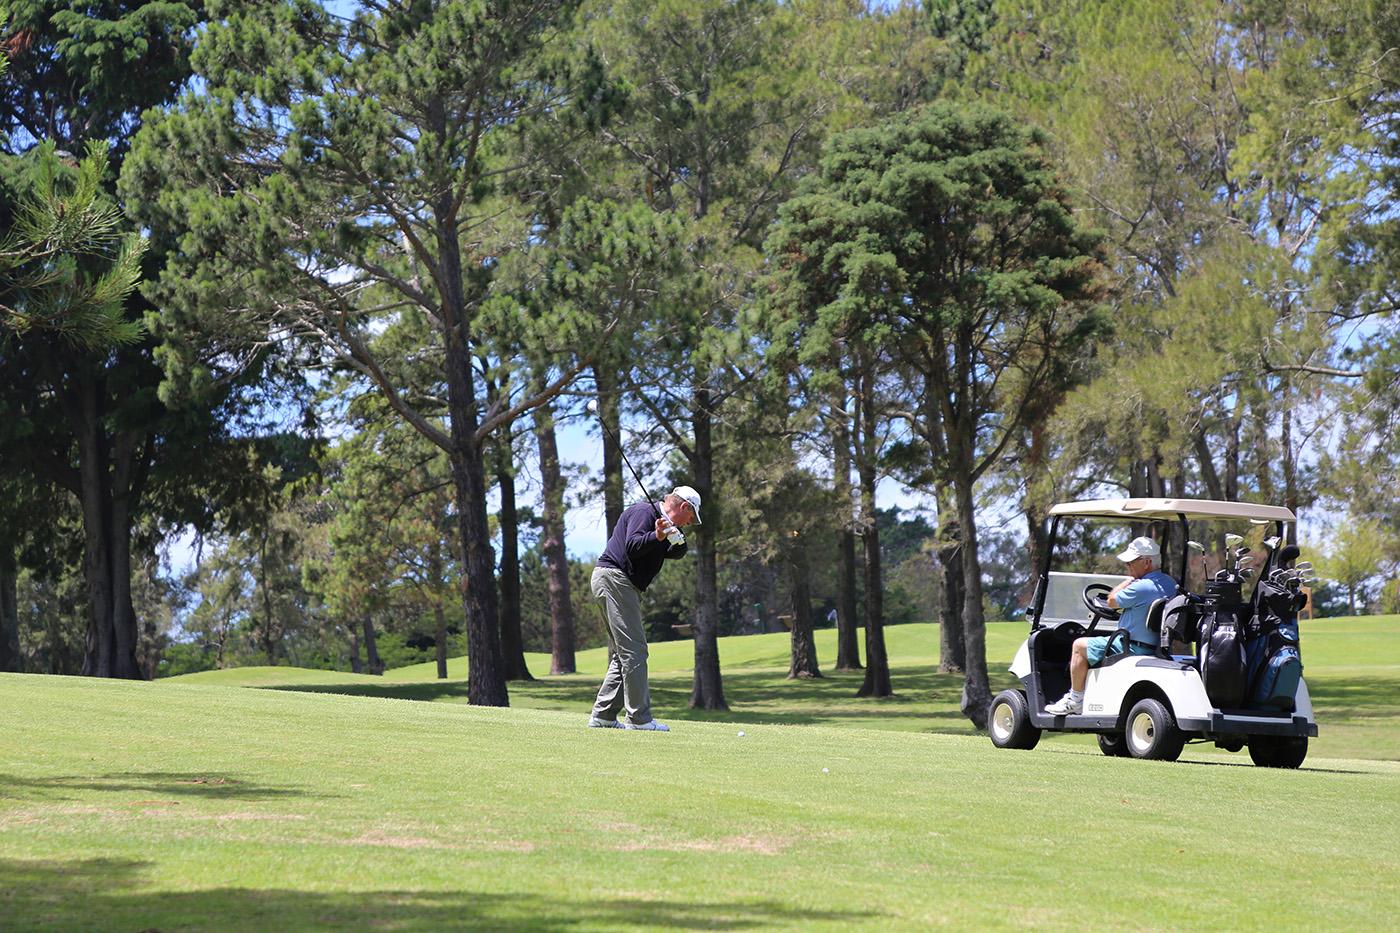 Rincón del Este - Especial Golf